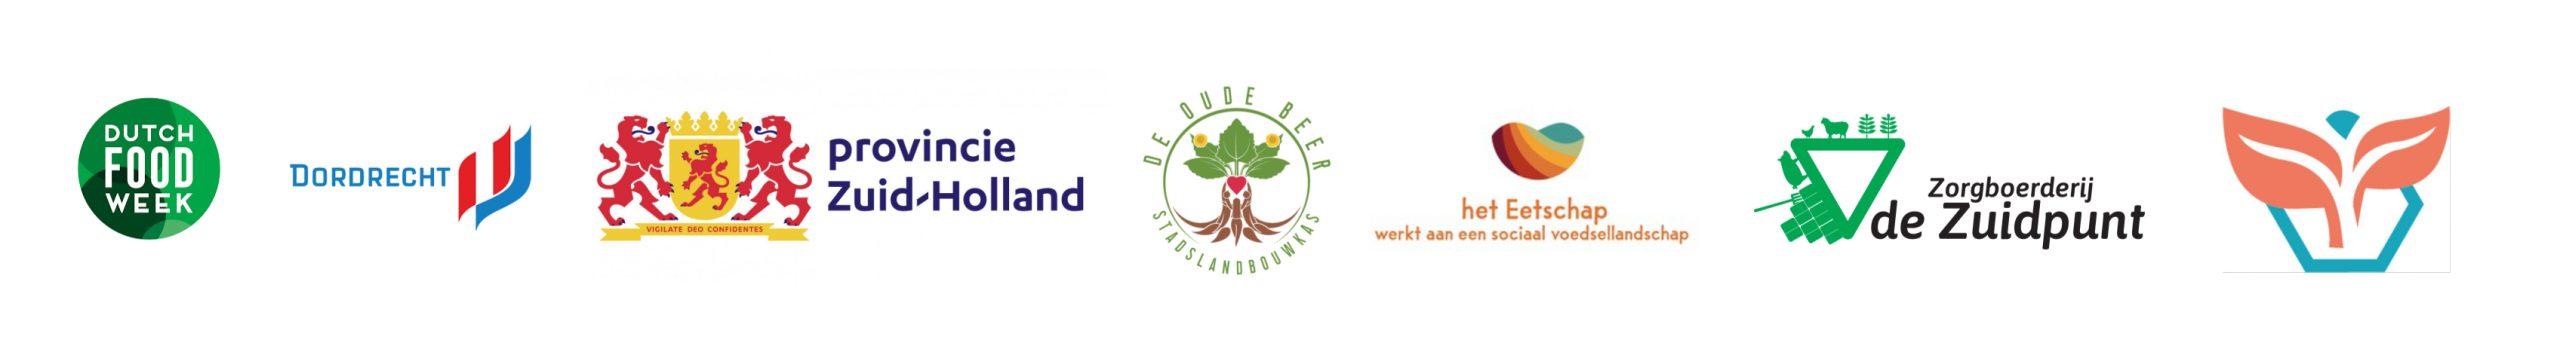 stadslandbouw tour logos